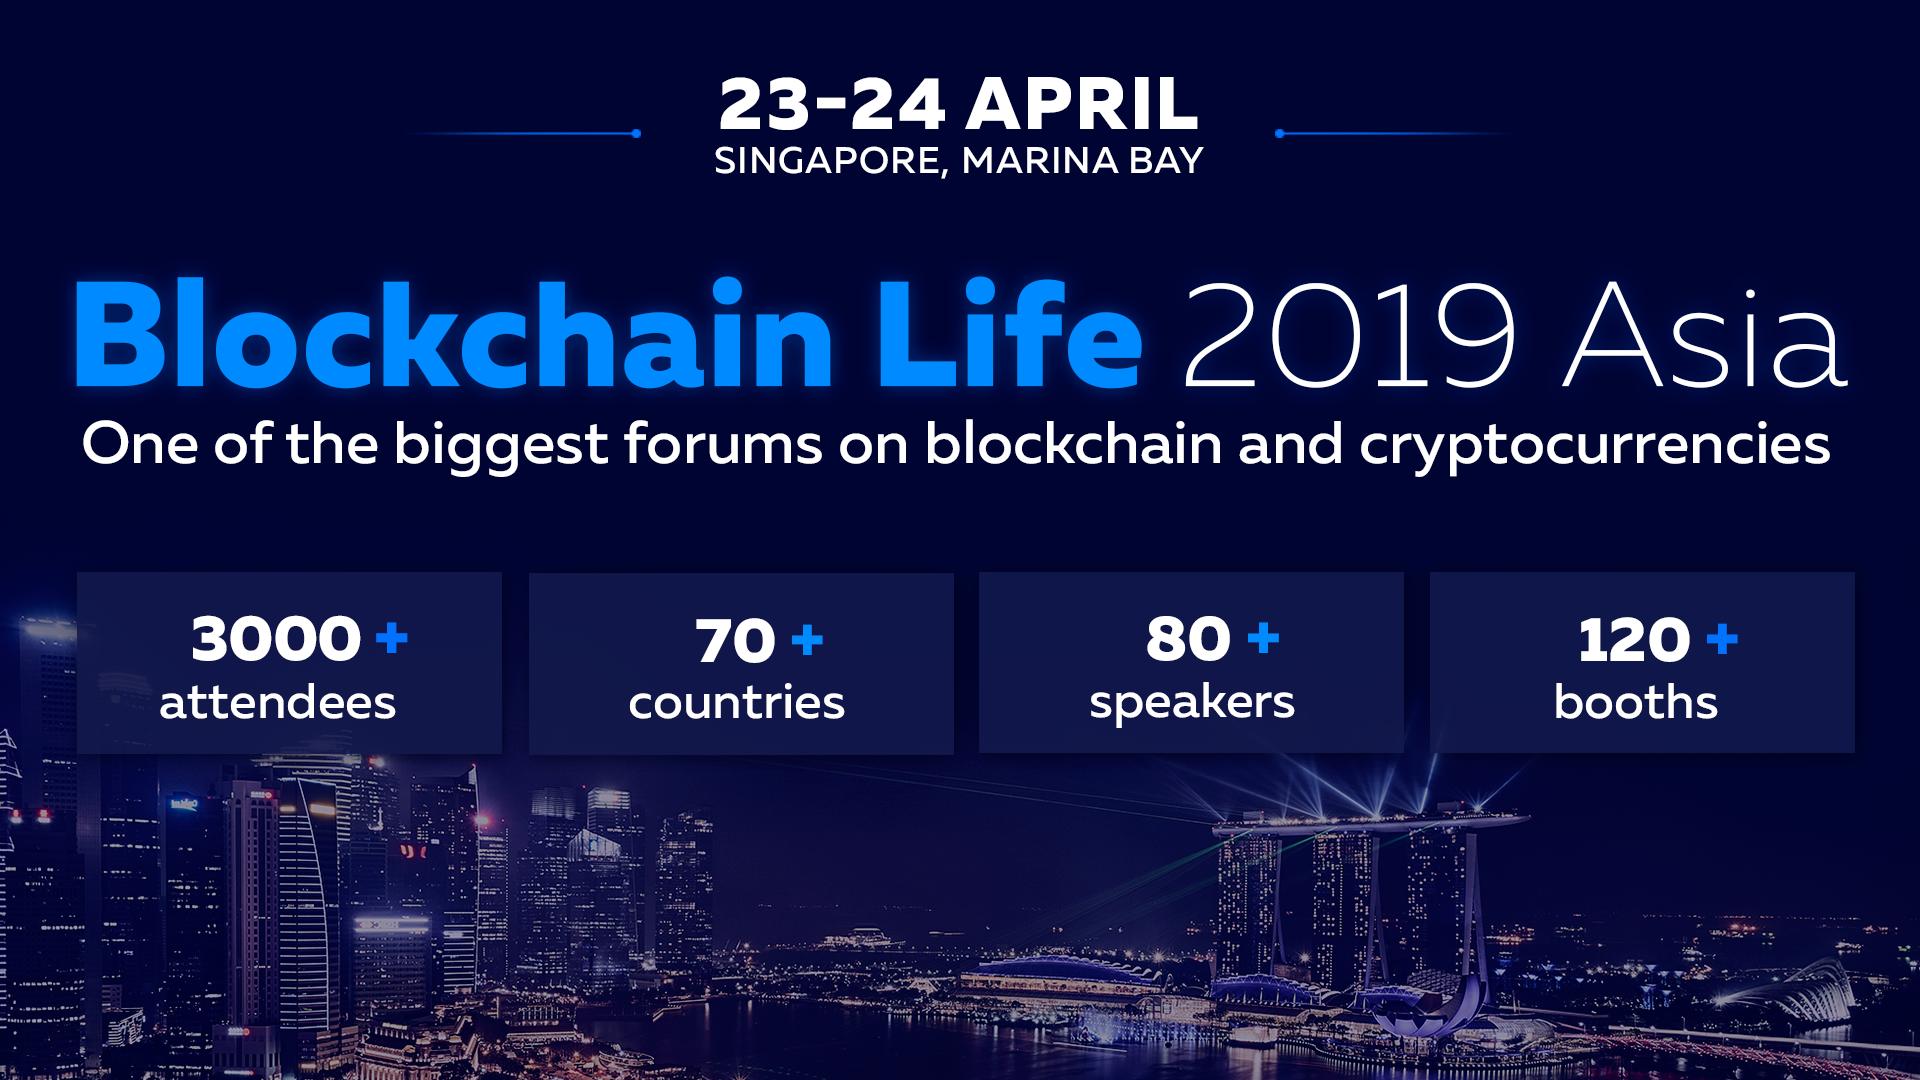 Blockchain Life 2019 區塊鏈生活全球論壇4月將於新加坡舉辦